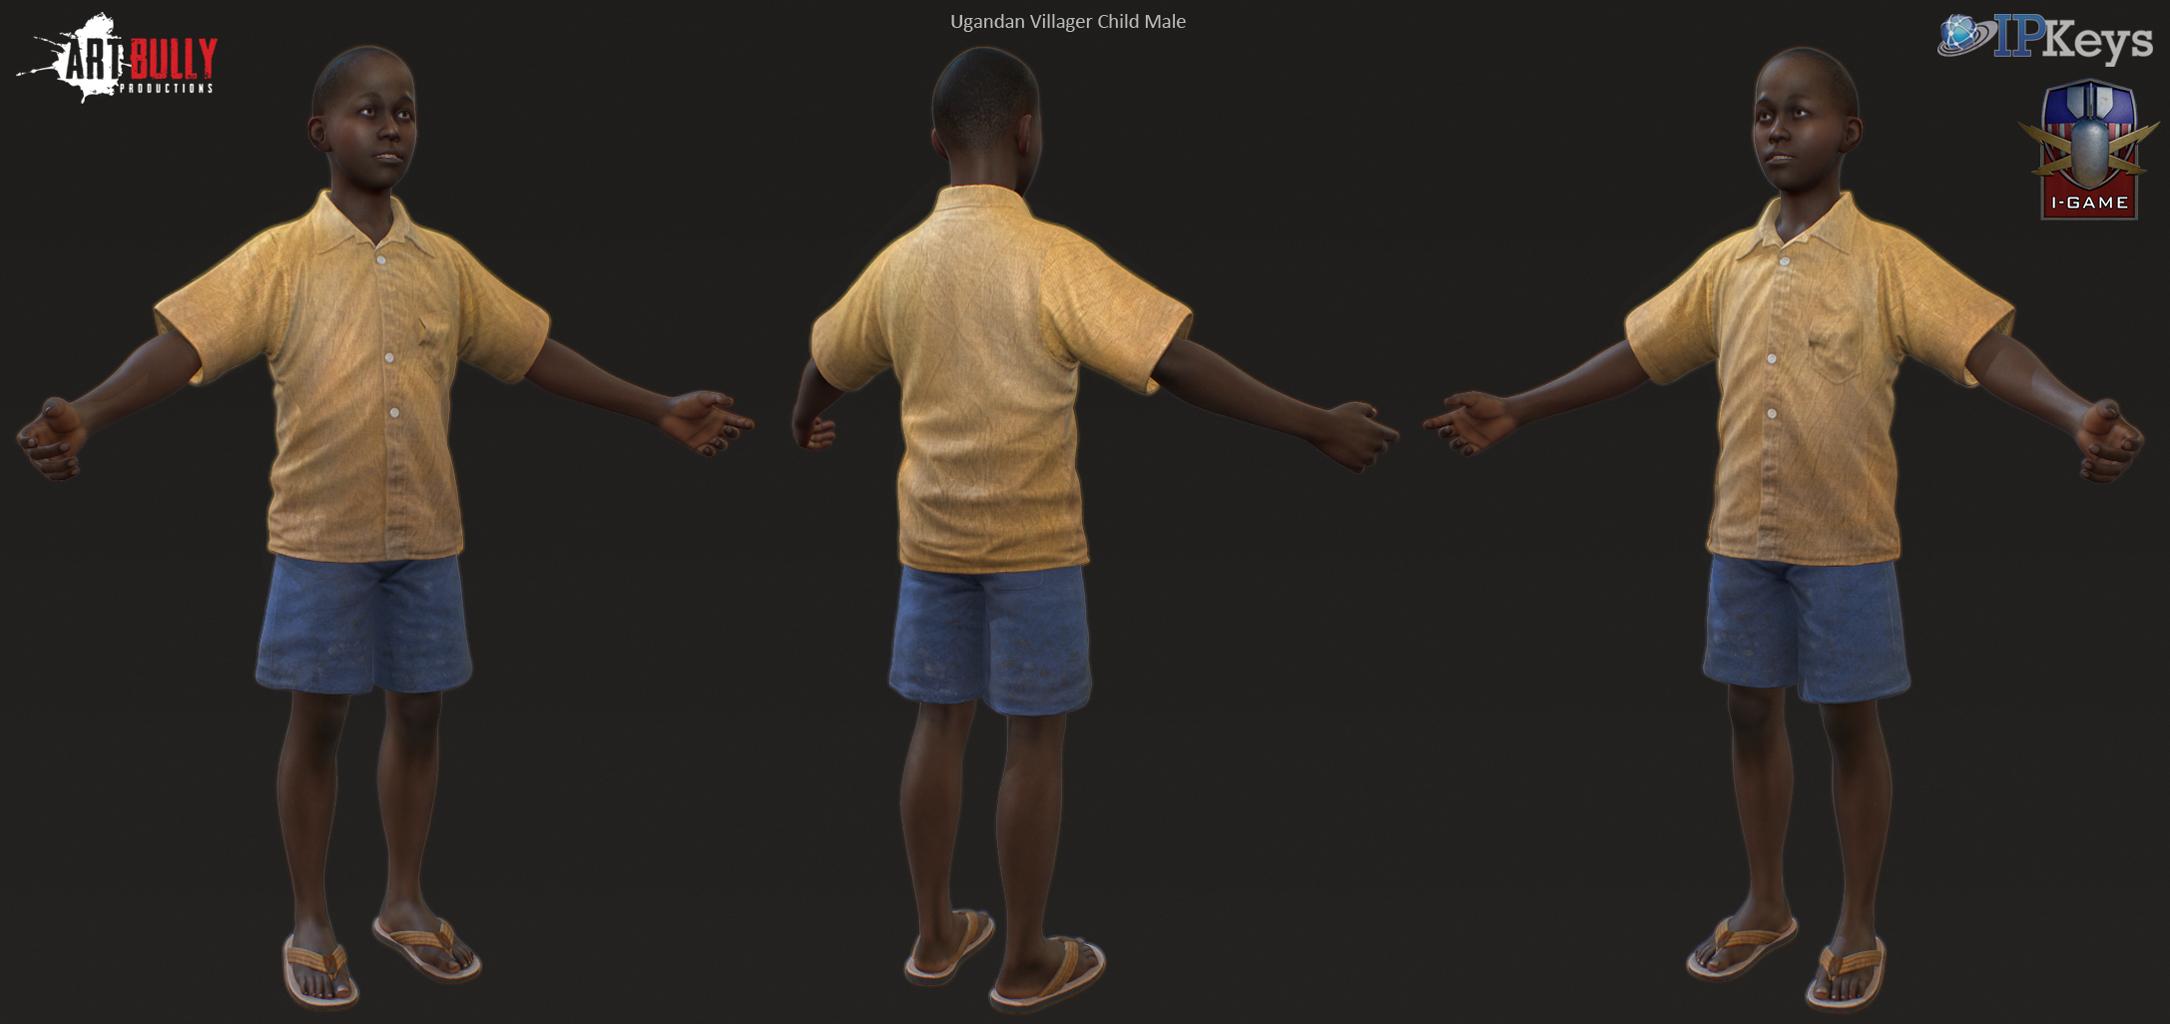 Ugandan_Villager_Child_Male.jpg